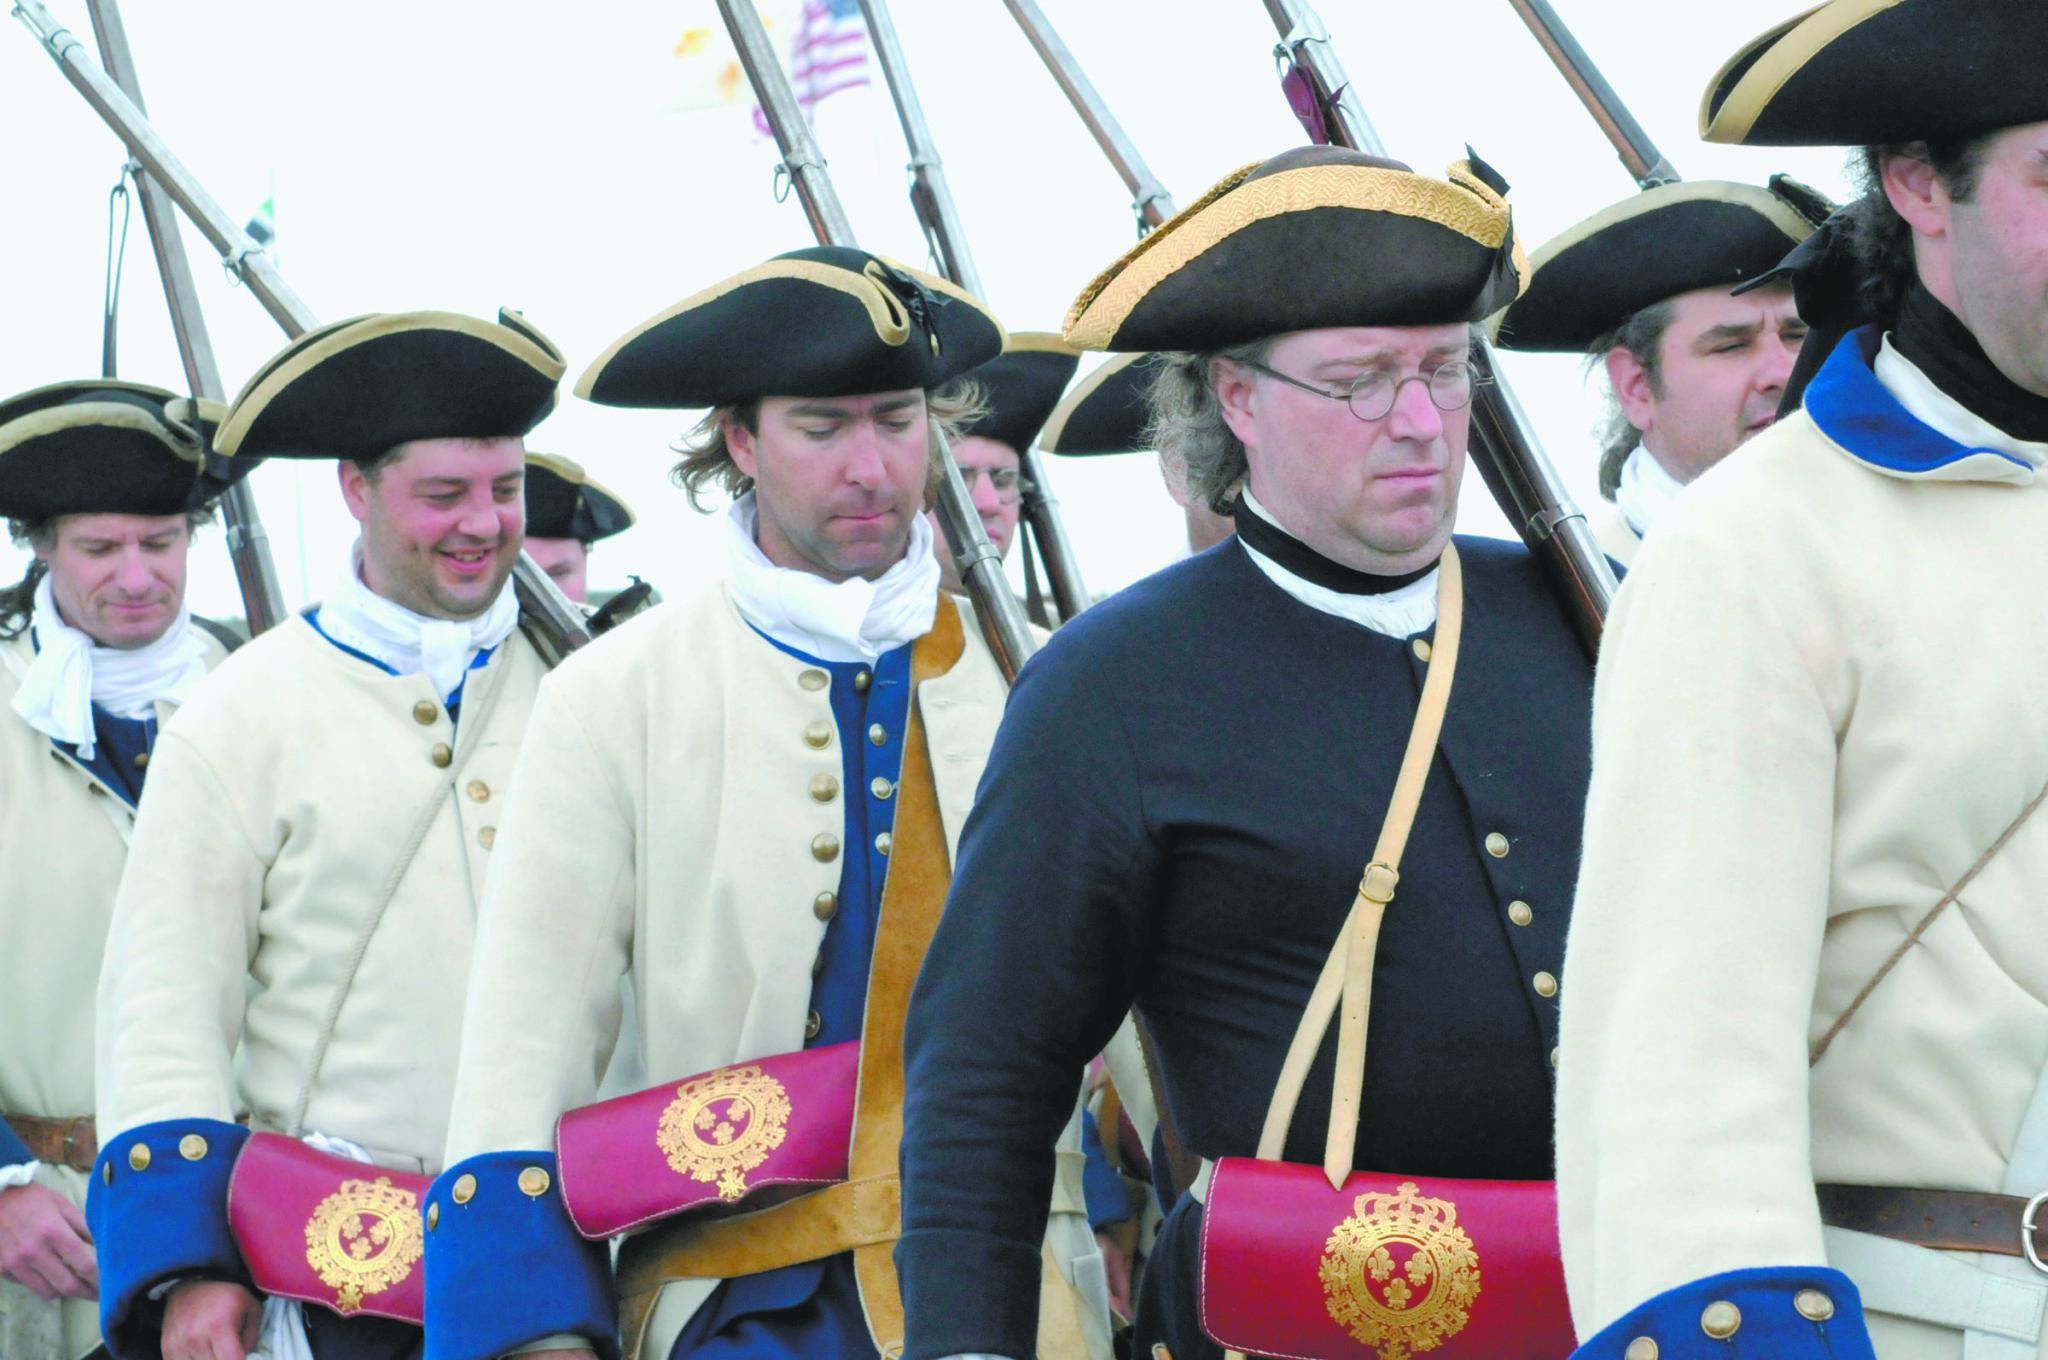 Fort Ticonderoga reenactment this weekend